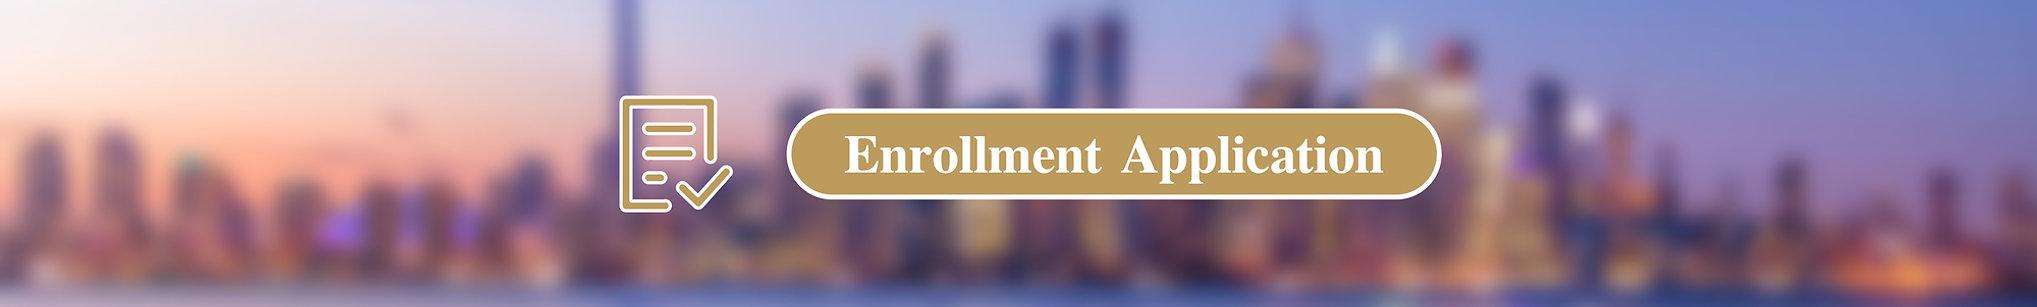 Enrollment application.jpg